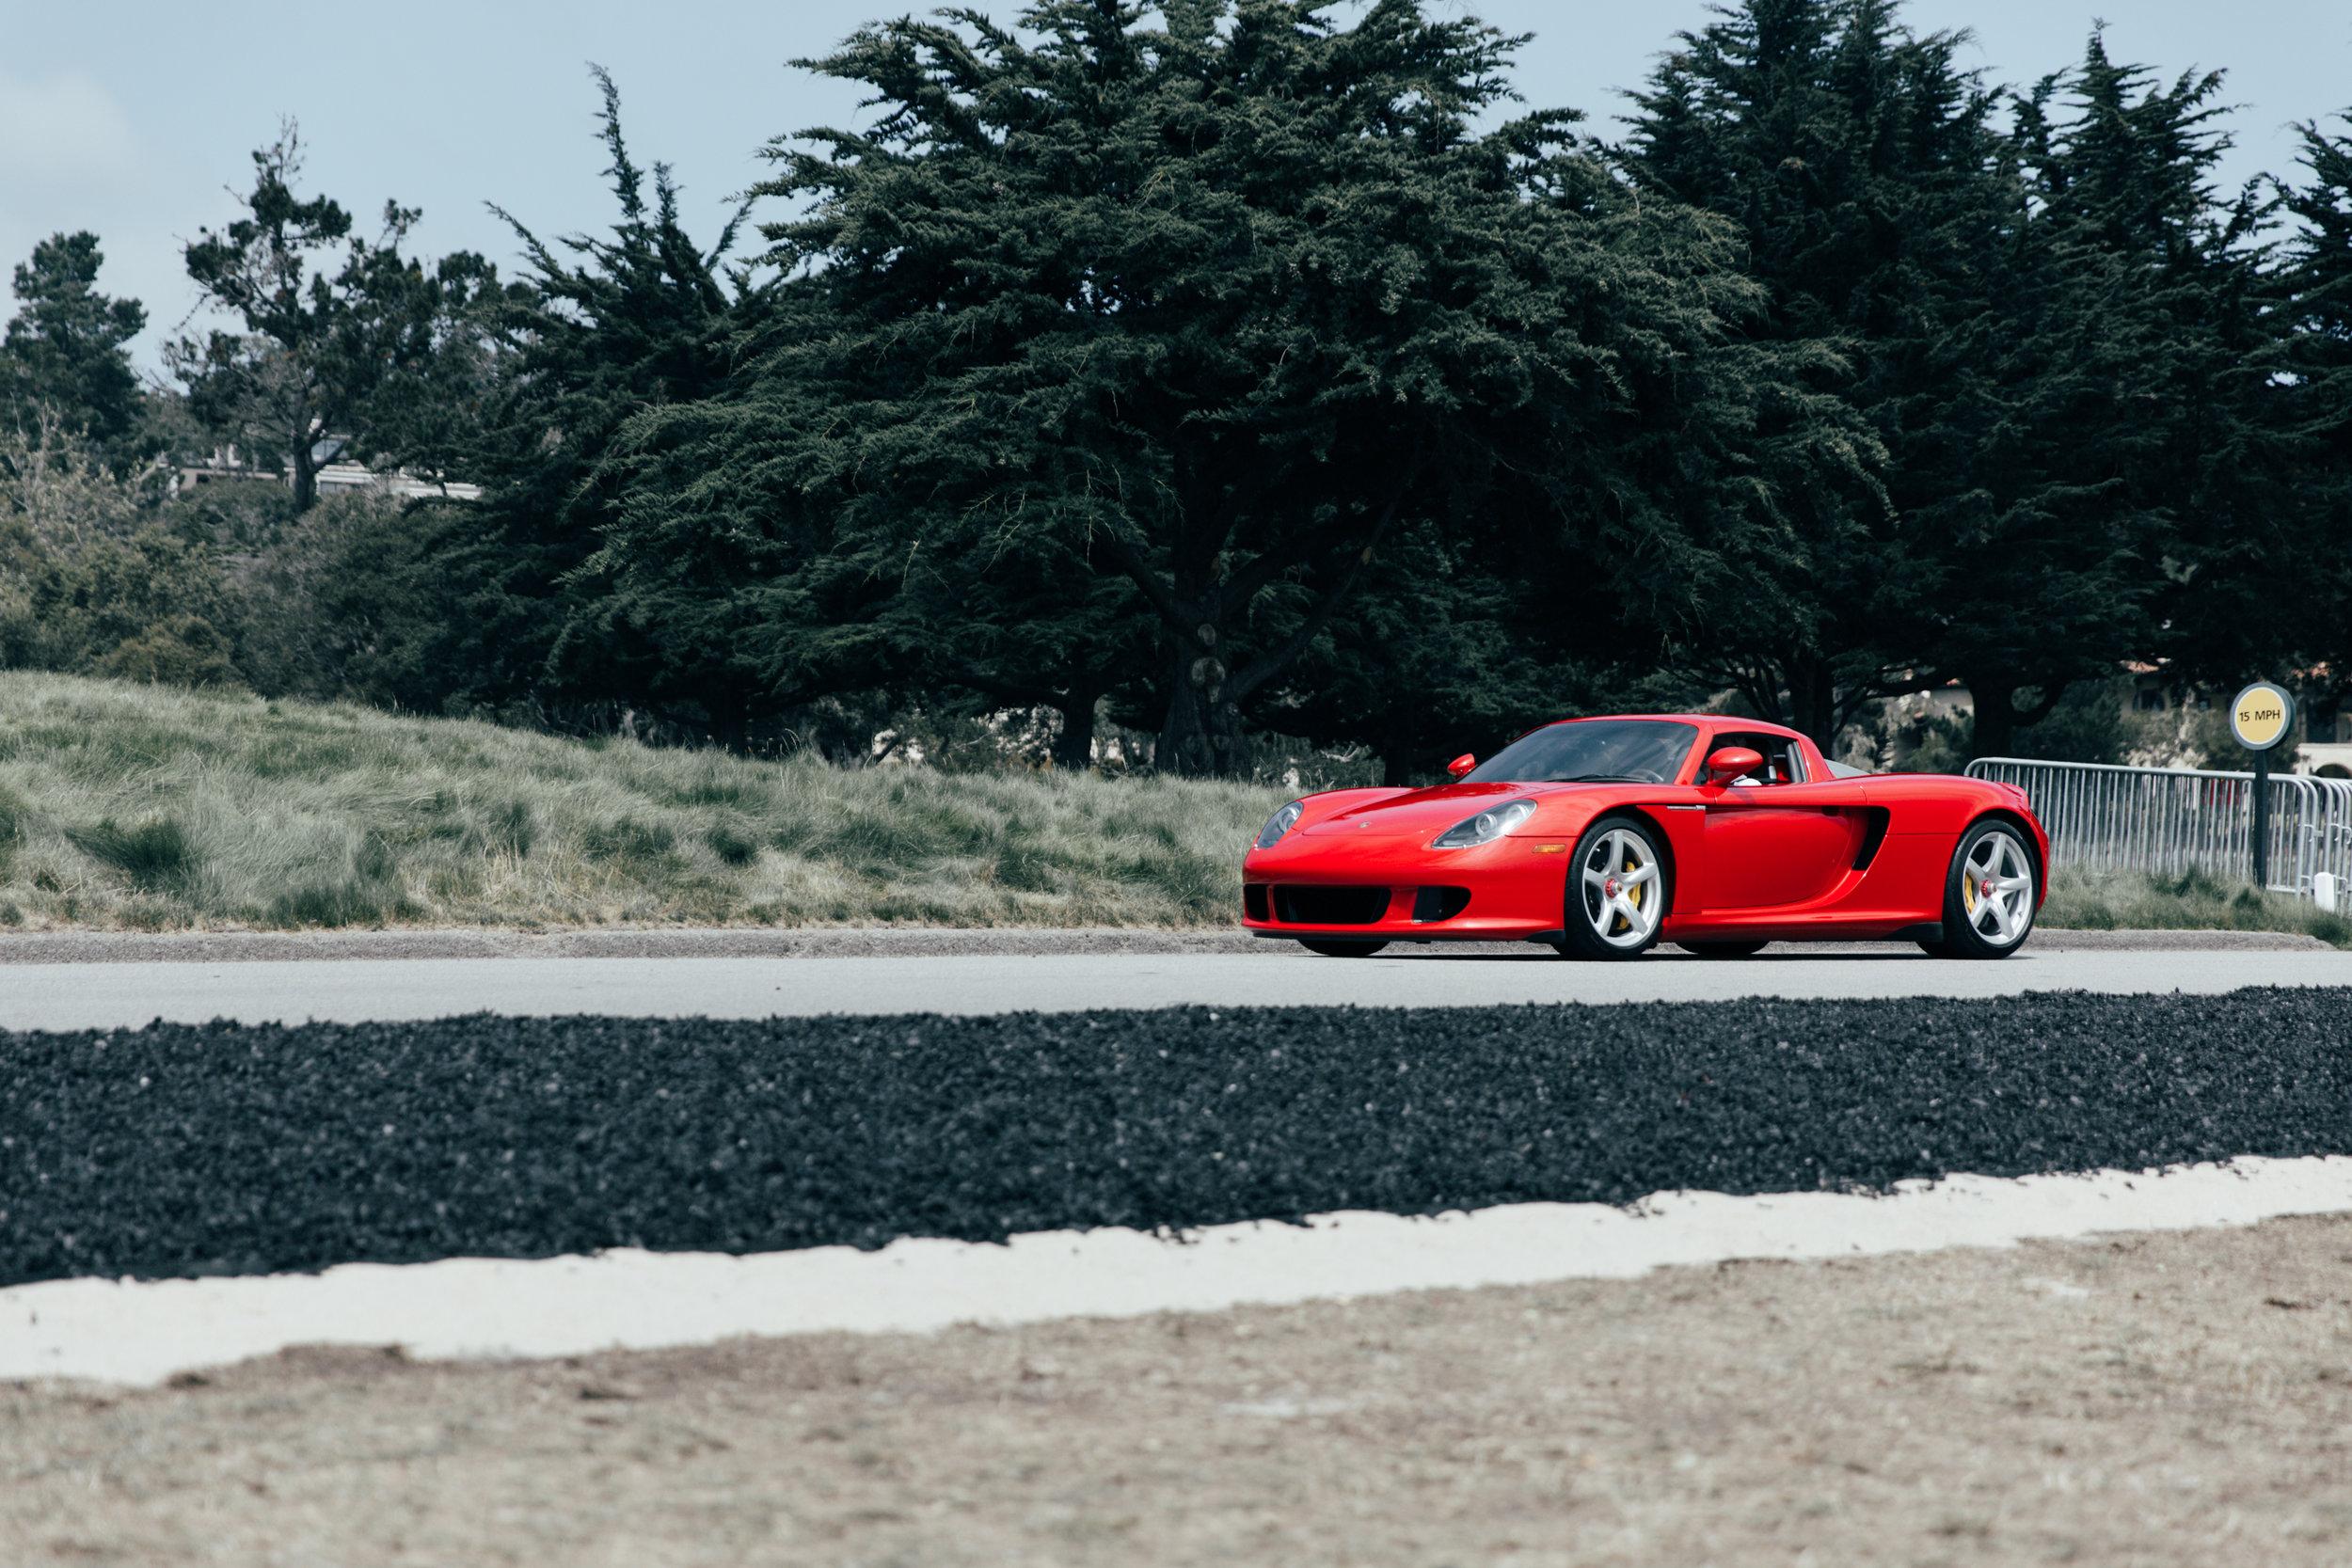 Stay_Driven_Monterey_Car_Week_1-14.jpg